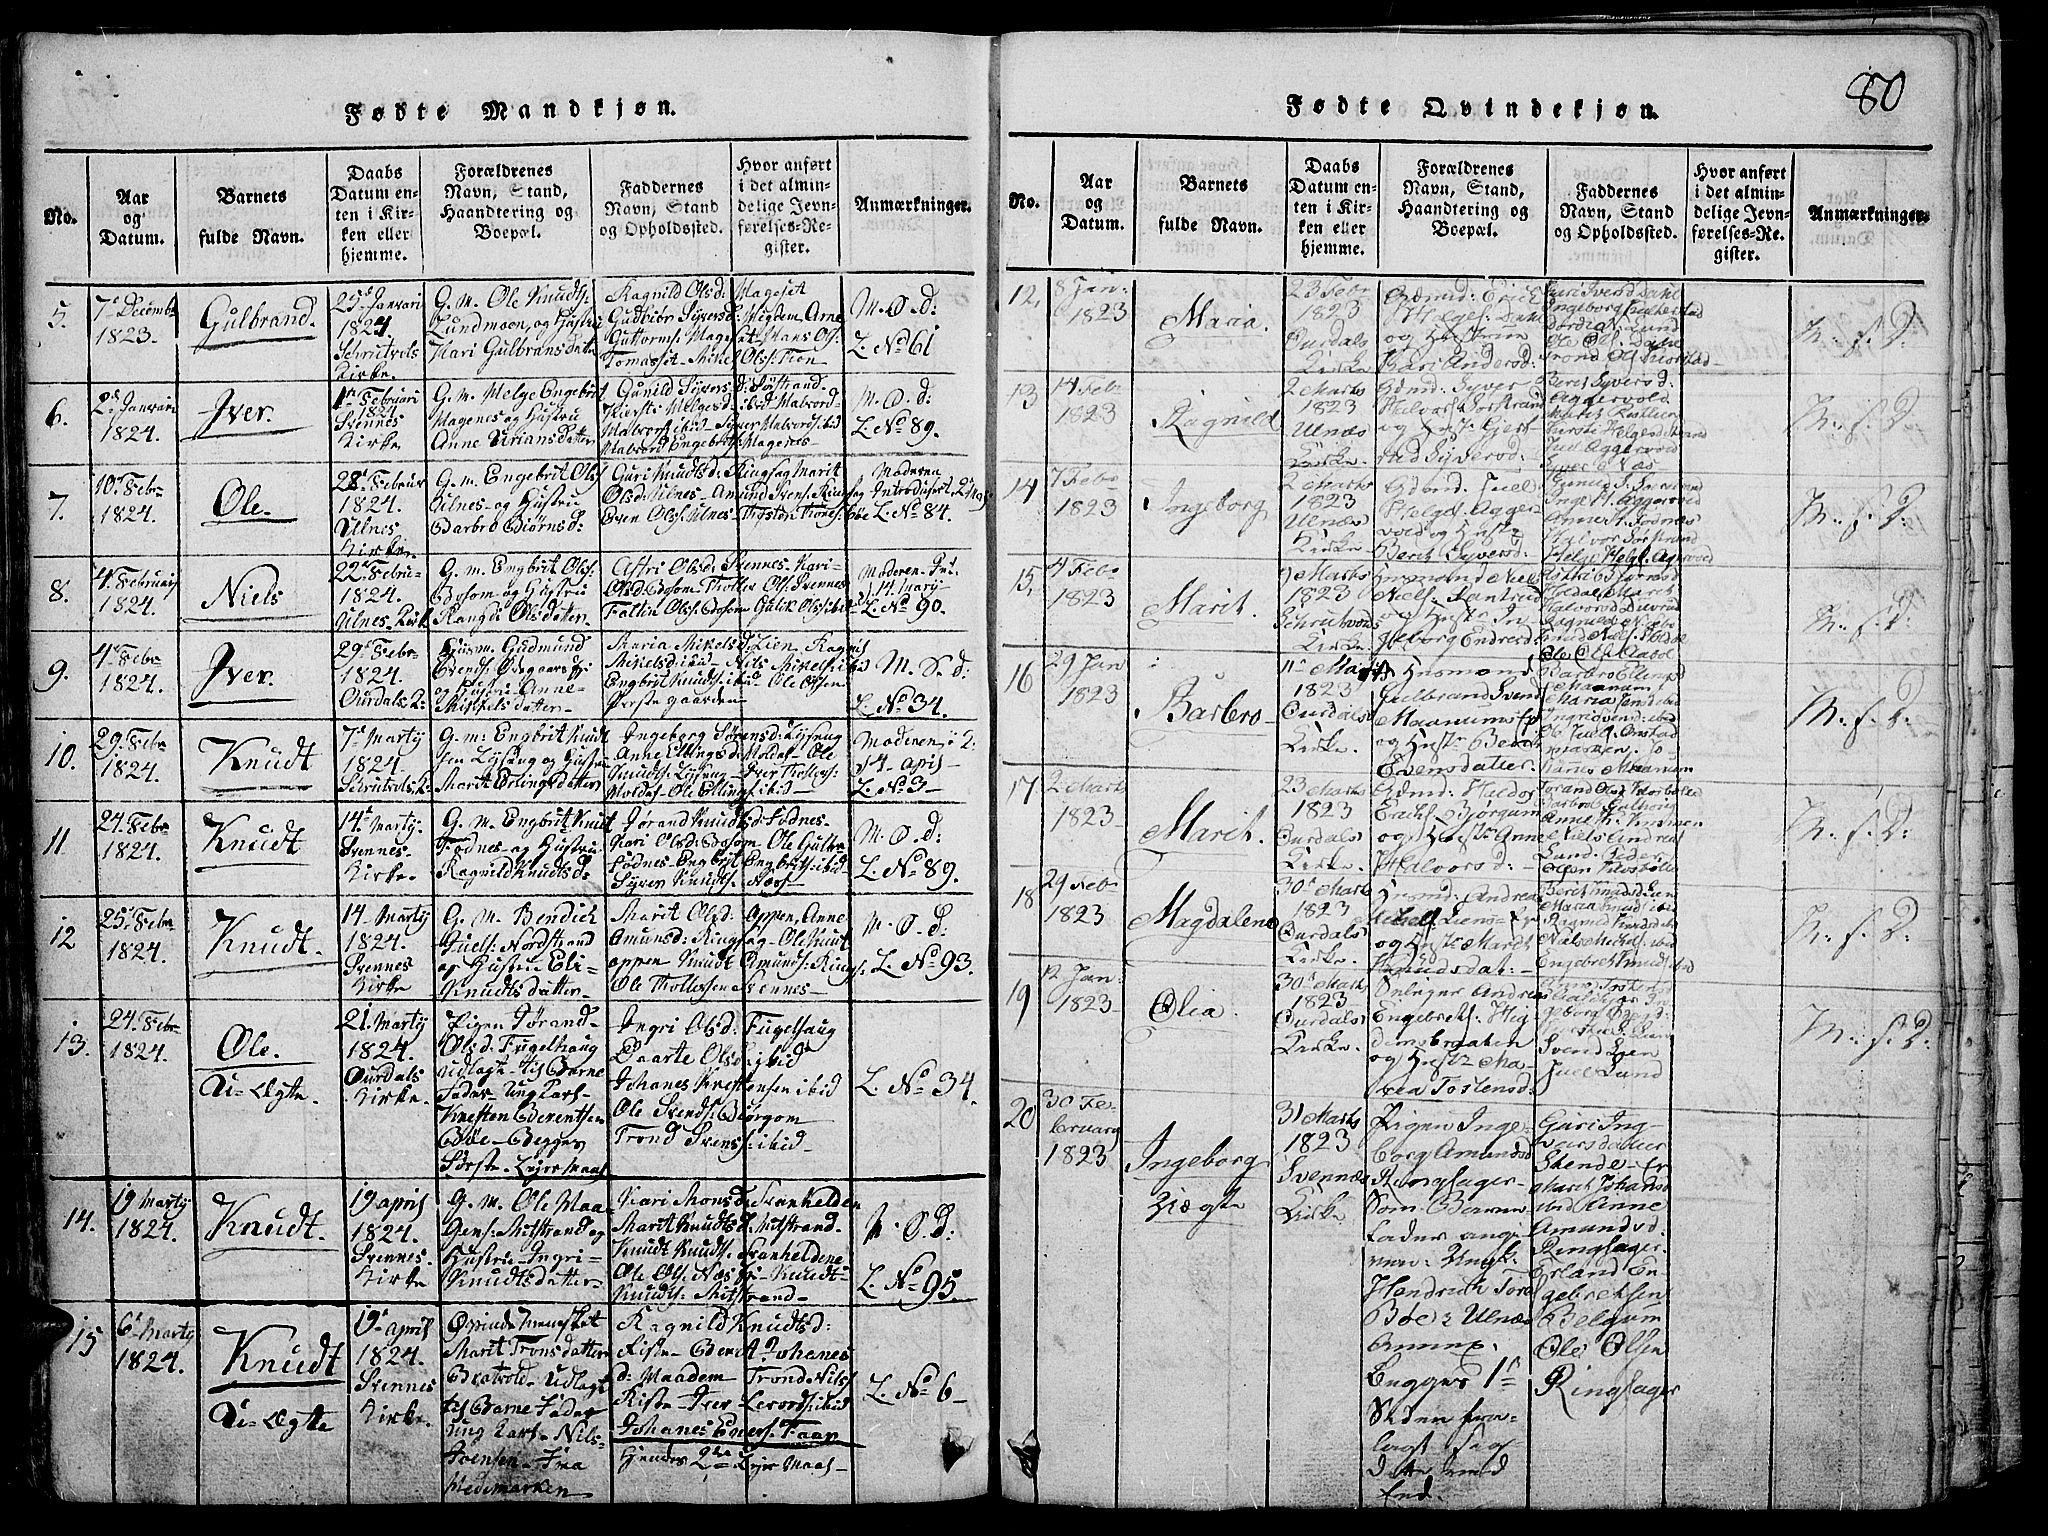 SAH, Nord-Aurdal prestekontor, Ministerialbok nr. 2, 1816-1828, s. 80